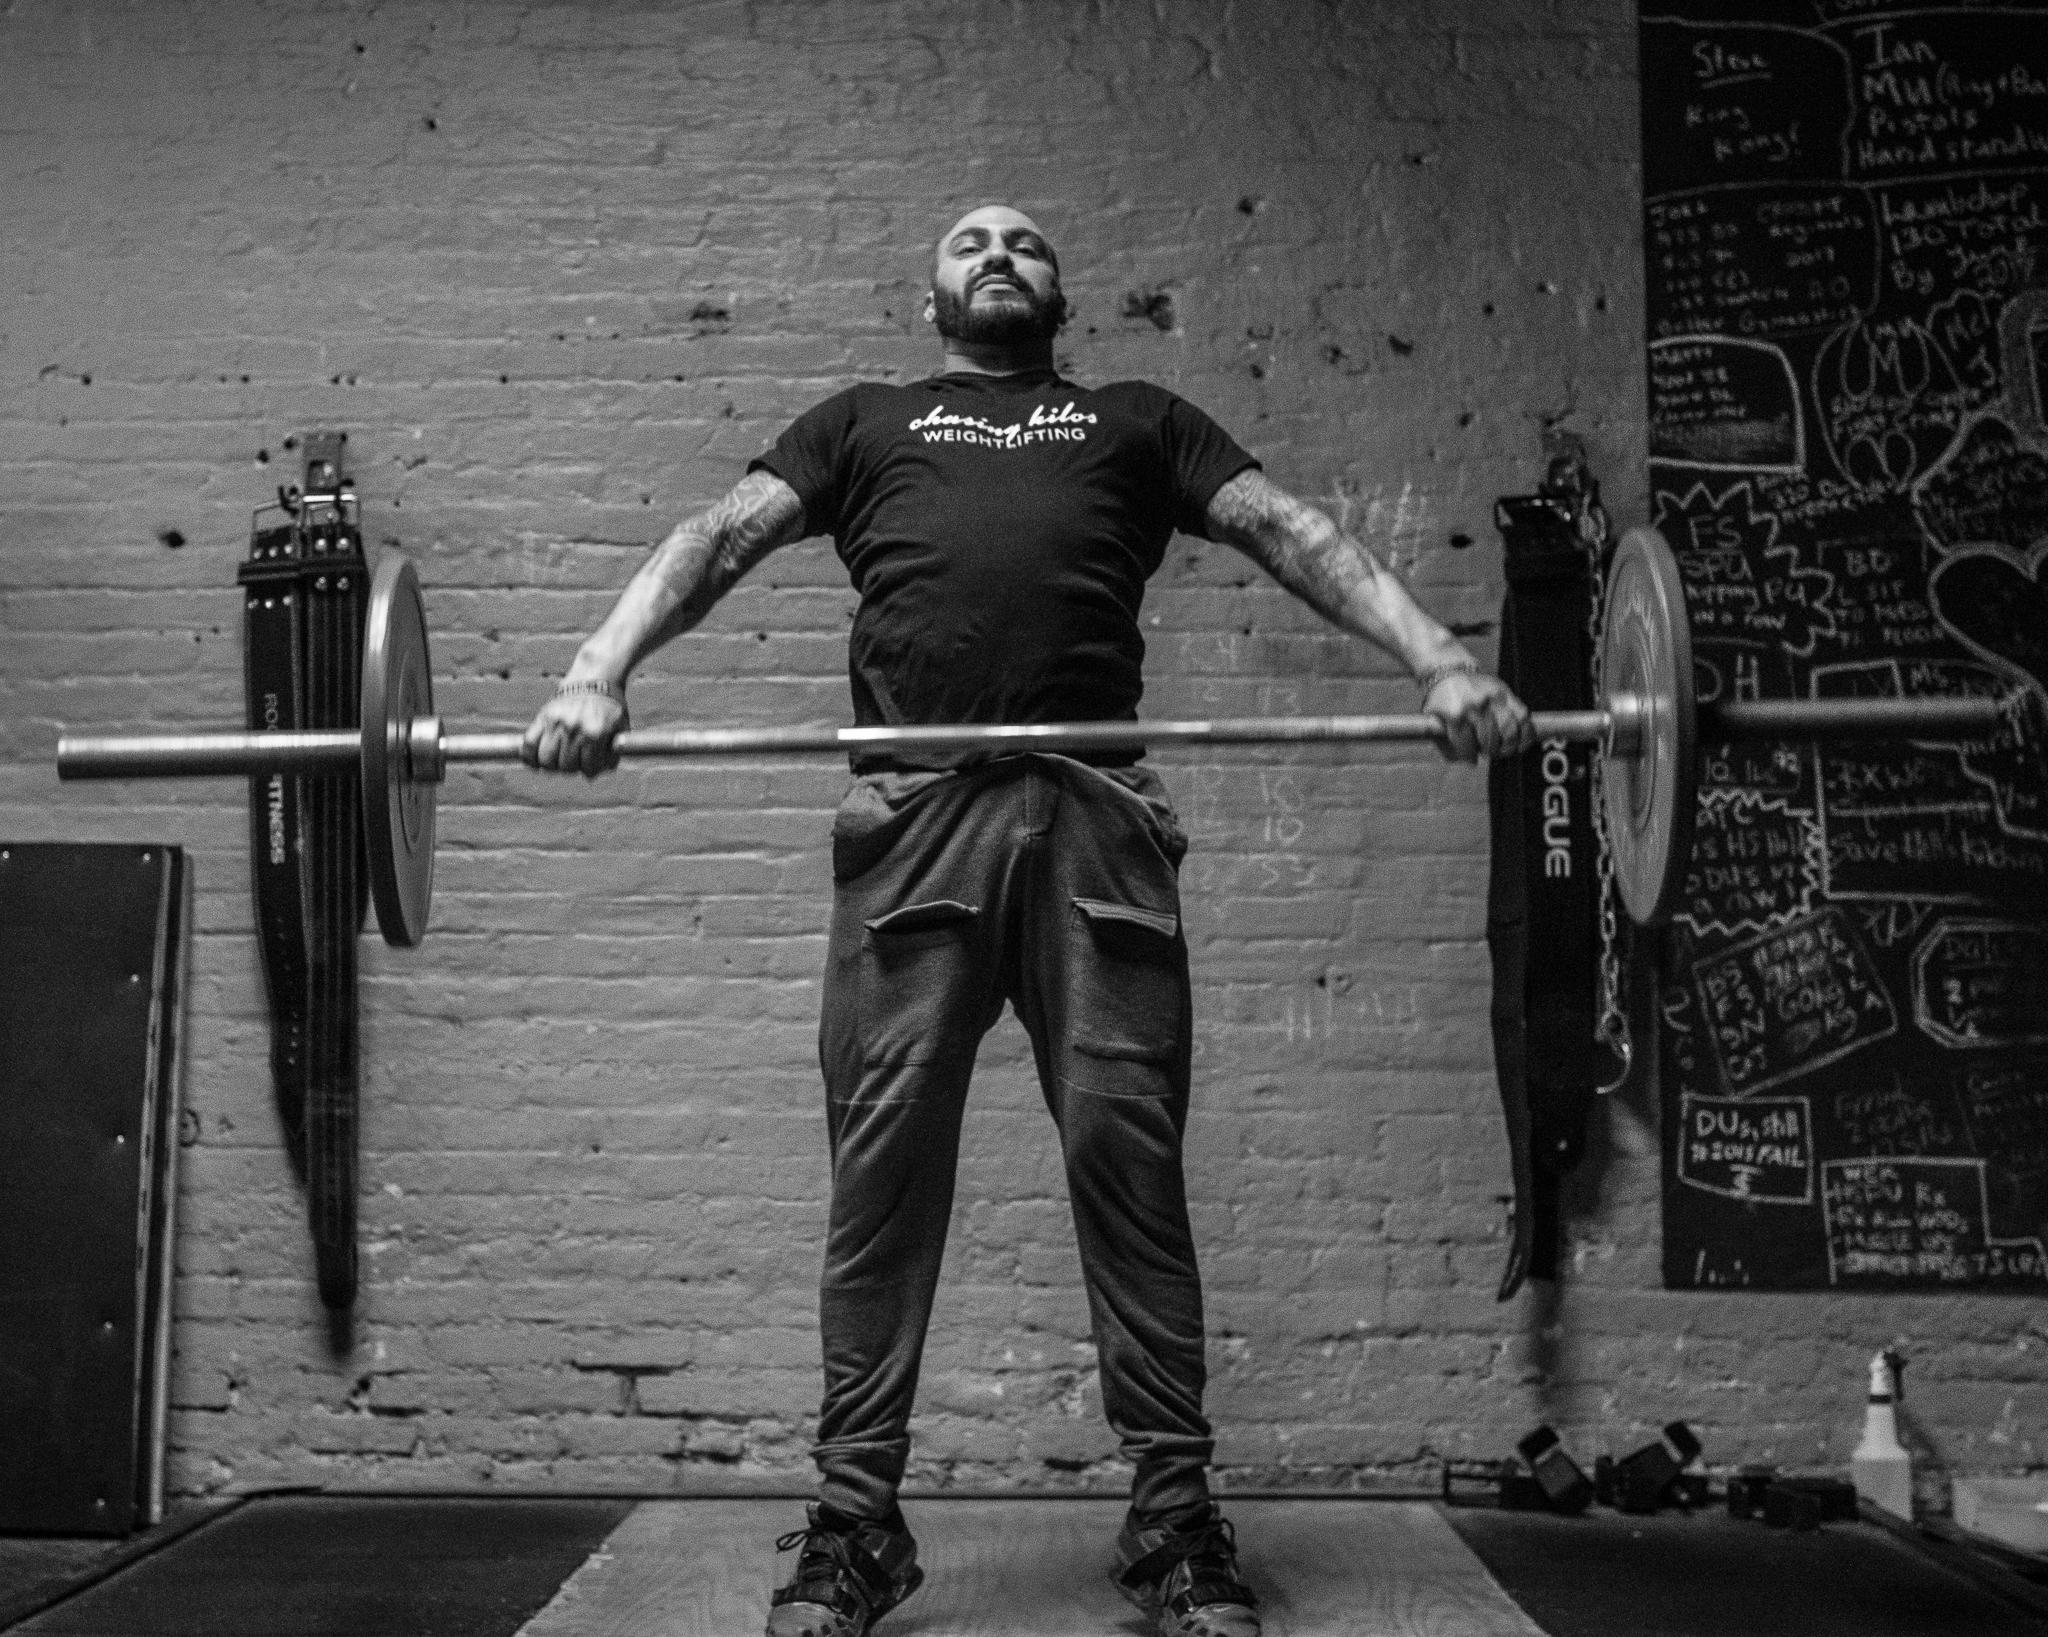 james-wright-visit-brooklyn-new-york-weightlifting-coach-teammates-october-2016 (52 of 92).jpg